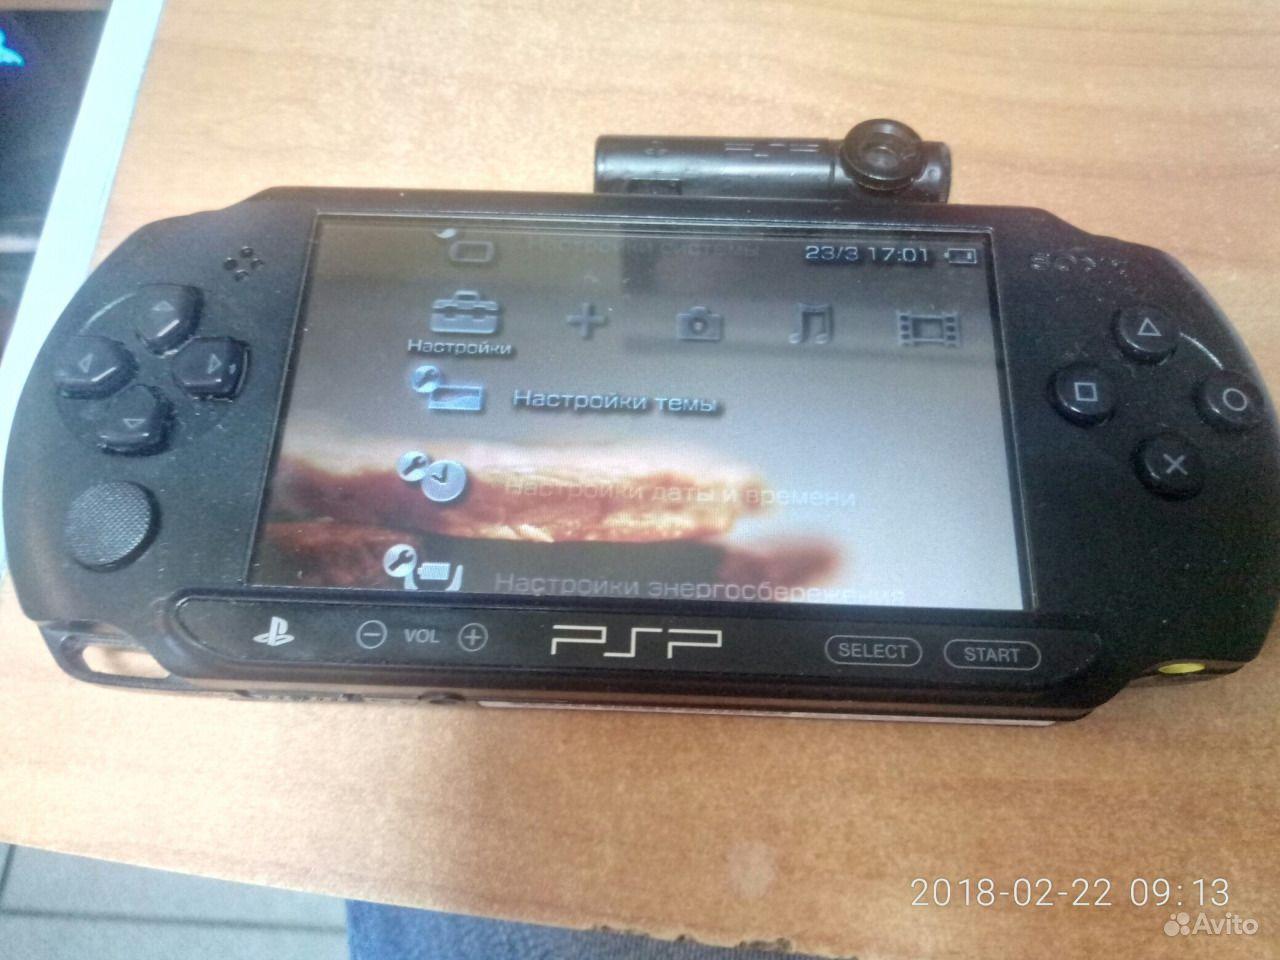 Sony PlayStation Portable E1004. Омская область,  Омск